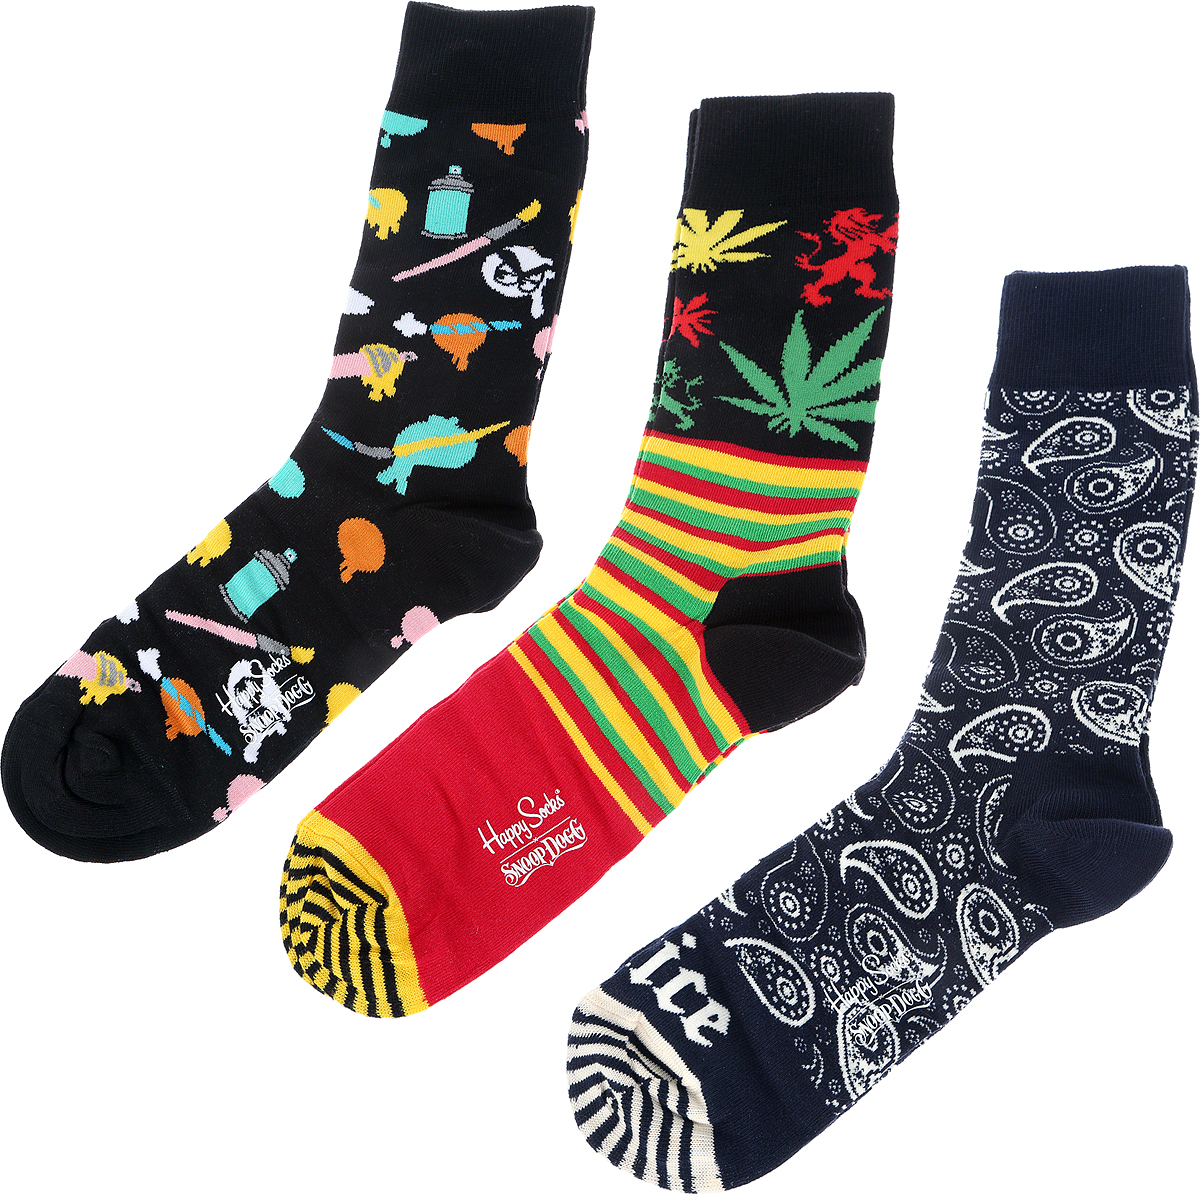 Носки мужские Happy Socks Snoop Dog, цвет: разноцветный, 4 пары. XSDG08_65. Размер 29 (41/46) носки minecraft socks 3 pack green зеленые s 3 пары 11750